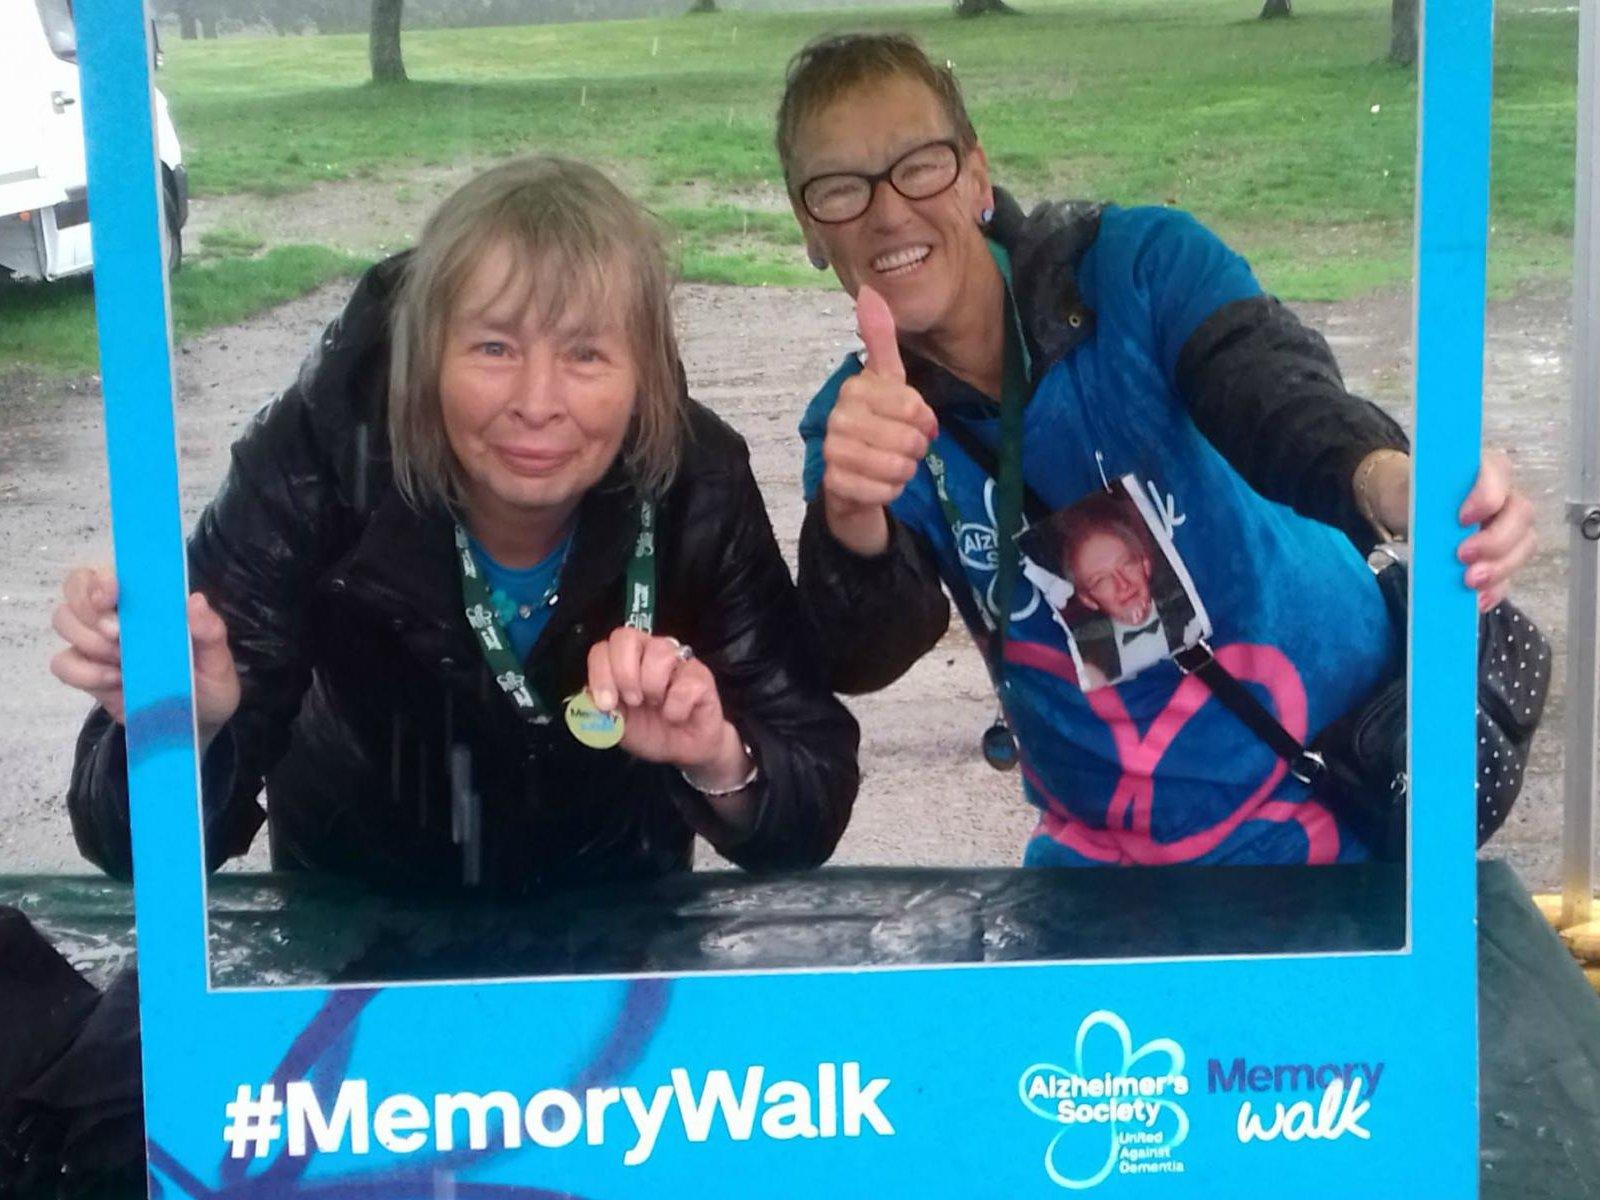 Jeanette at Memory Walk